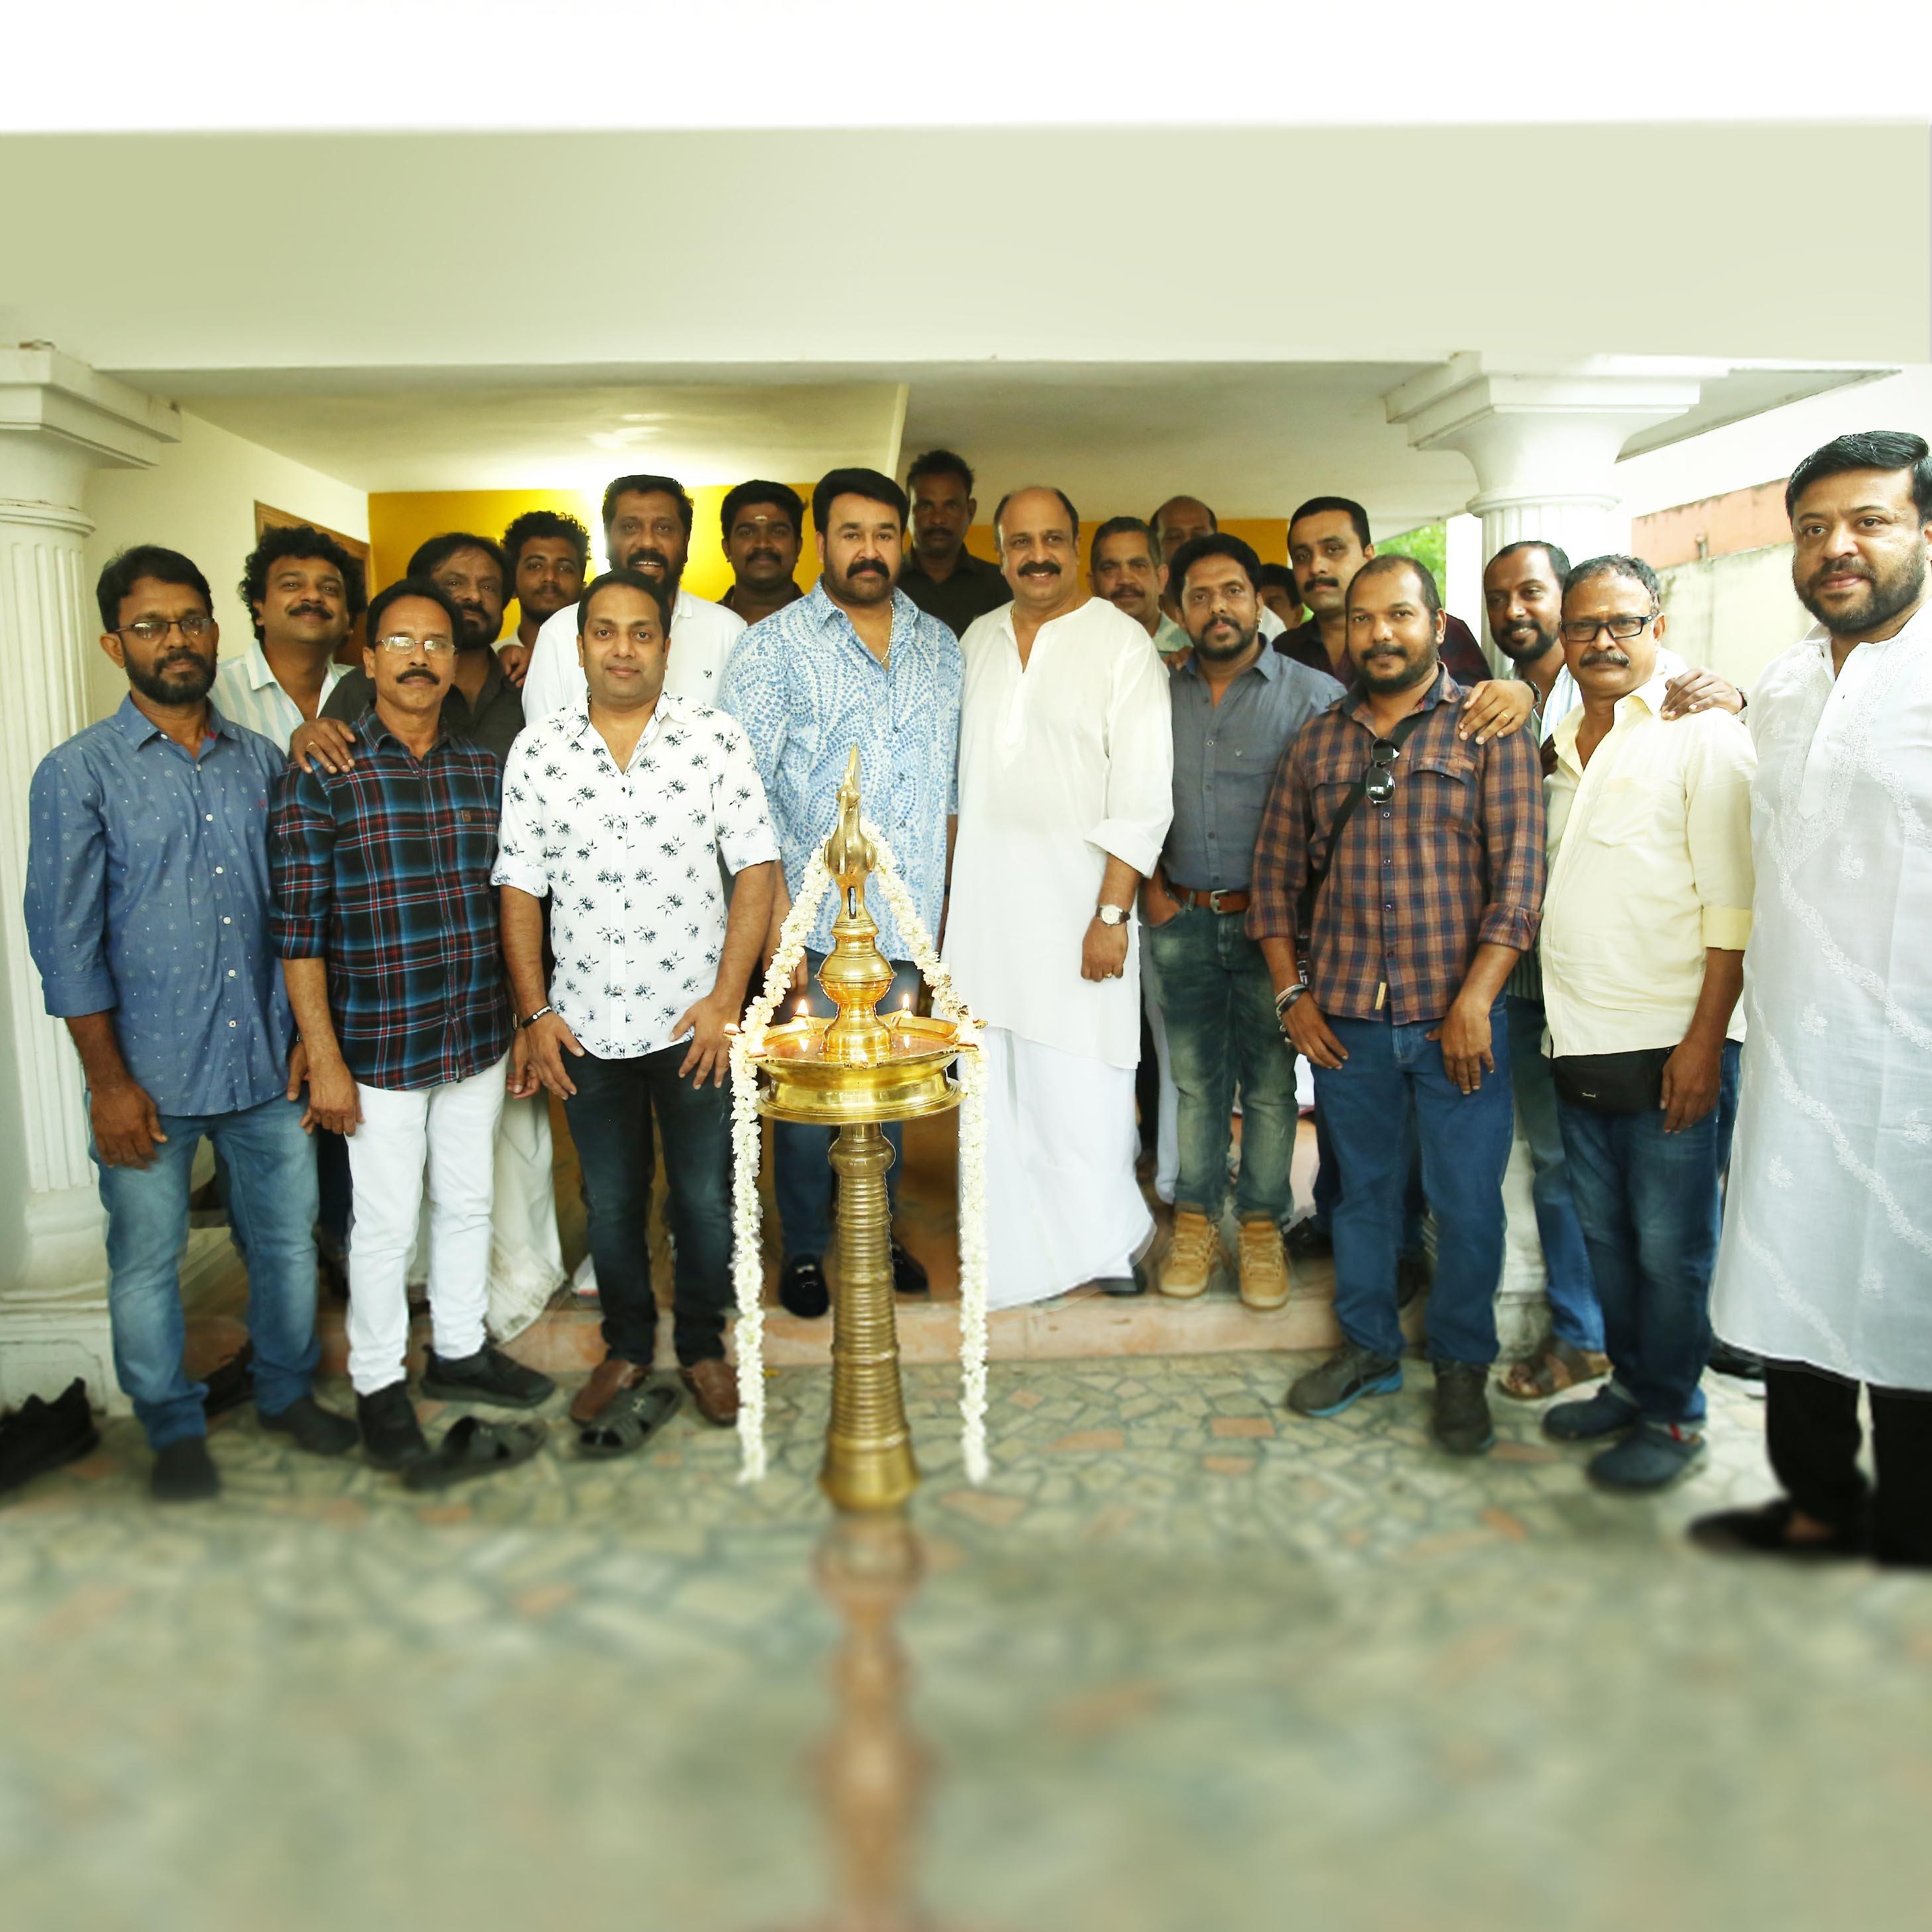 Big Brother's Pooja Held in Kochi